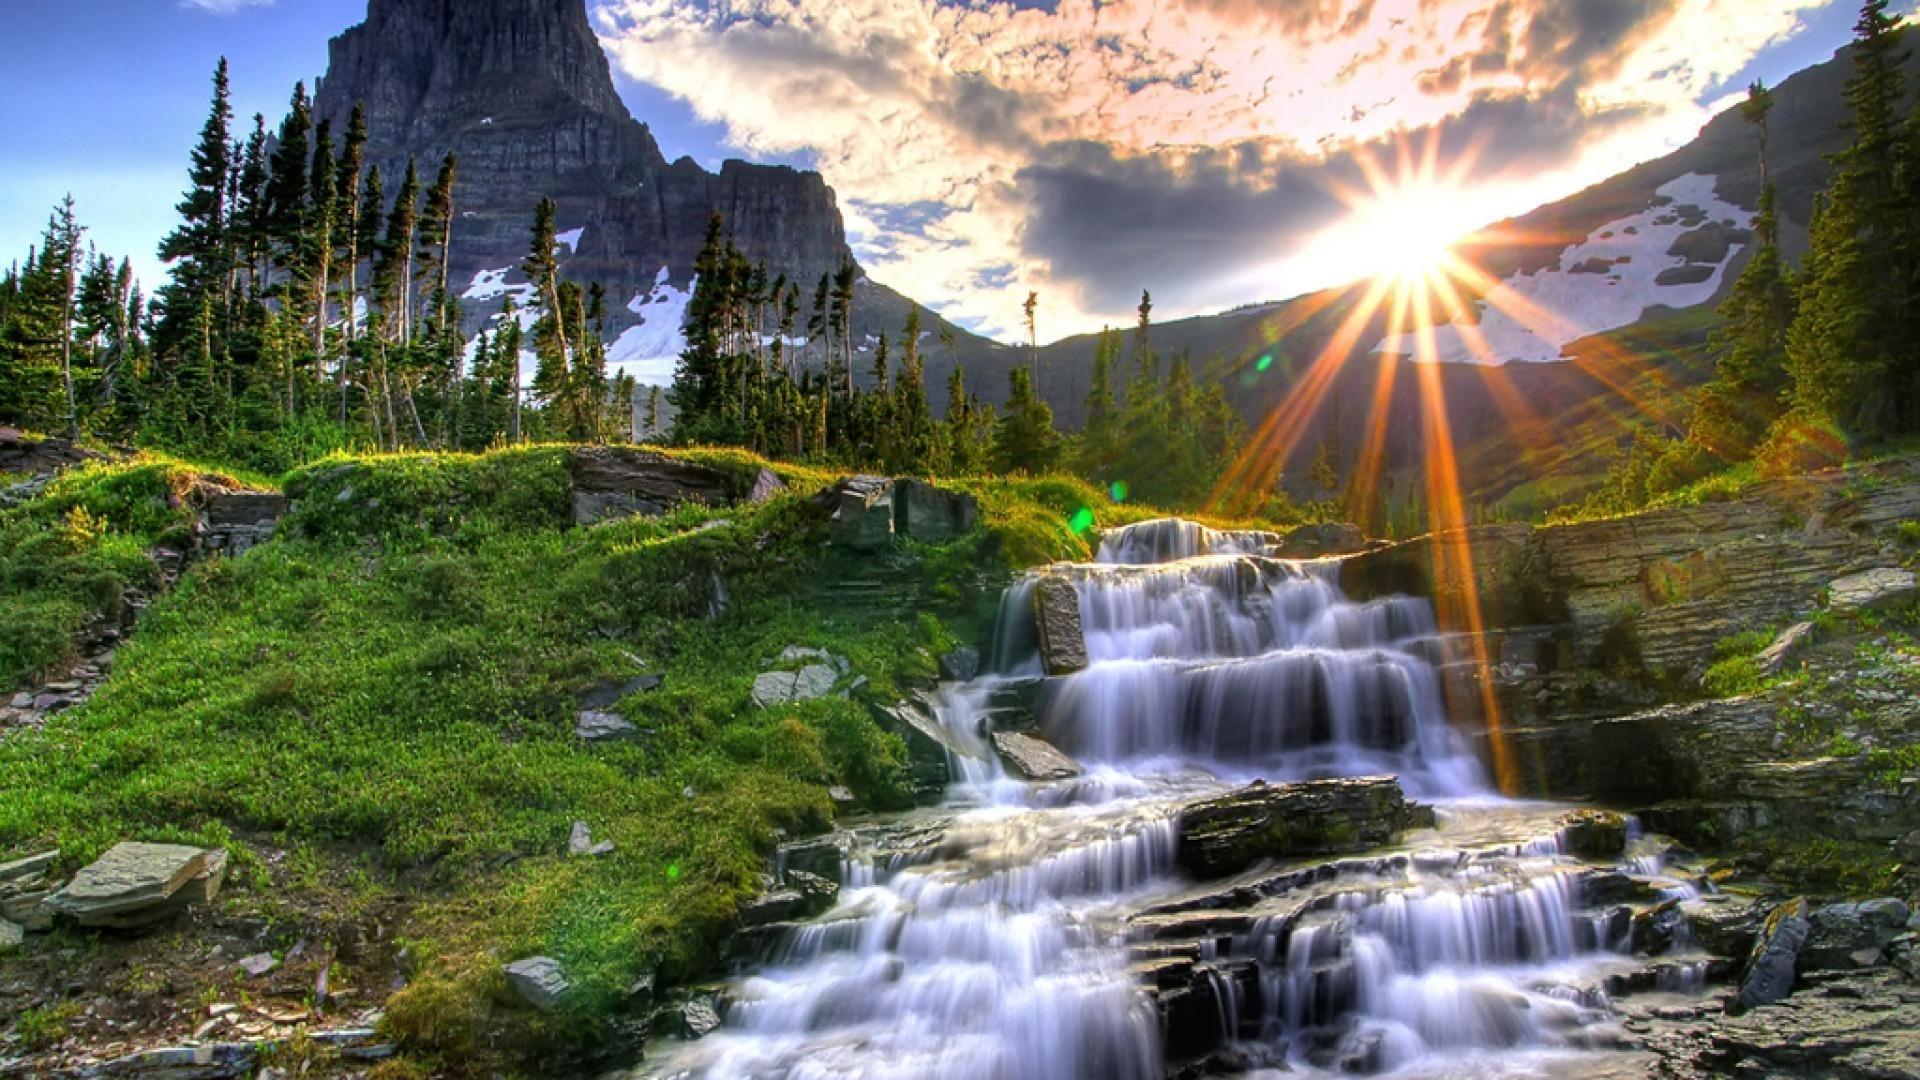 10 most popular waterfall wallpaper hd 1080p full hd 1920×1080 for